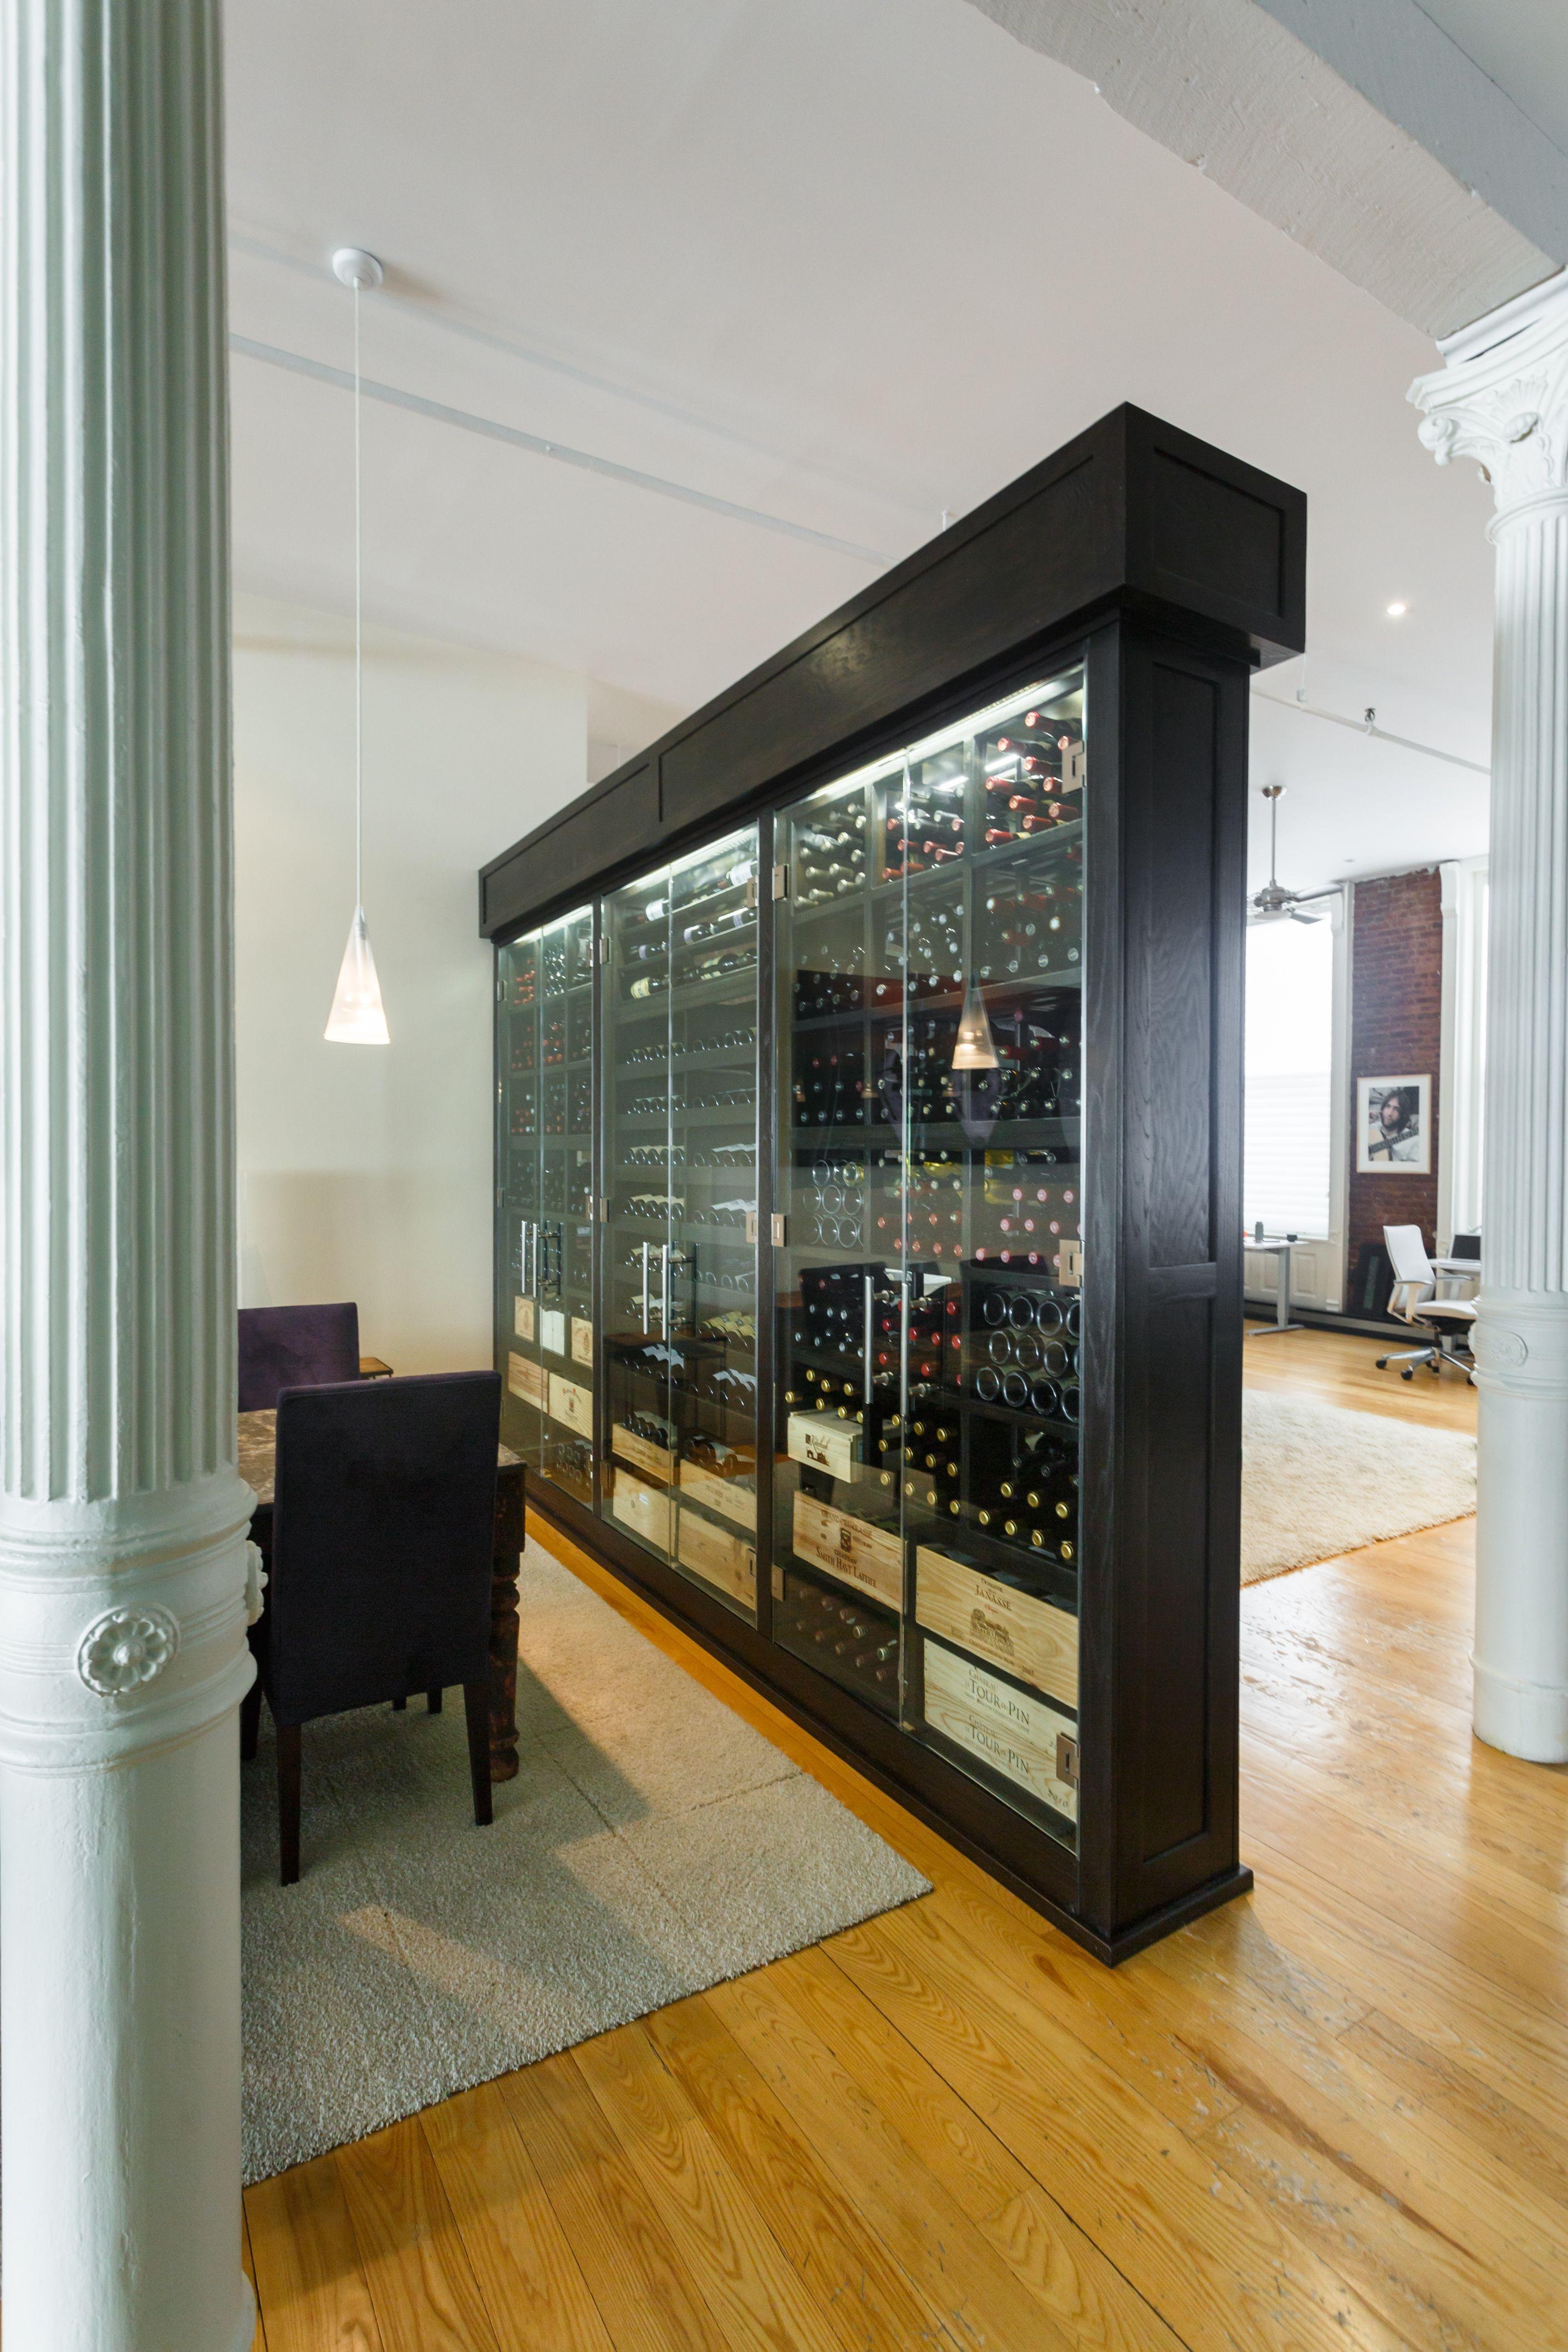 Reussir L Amenagement De Ma Cave A Vin Home Wine Cellars